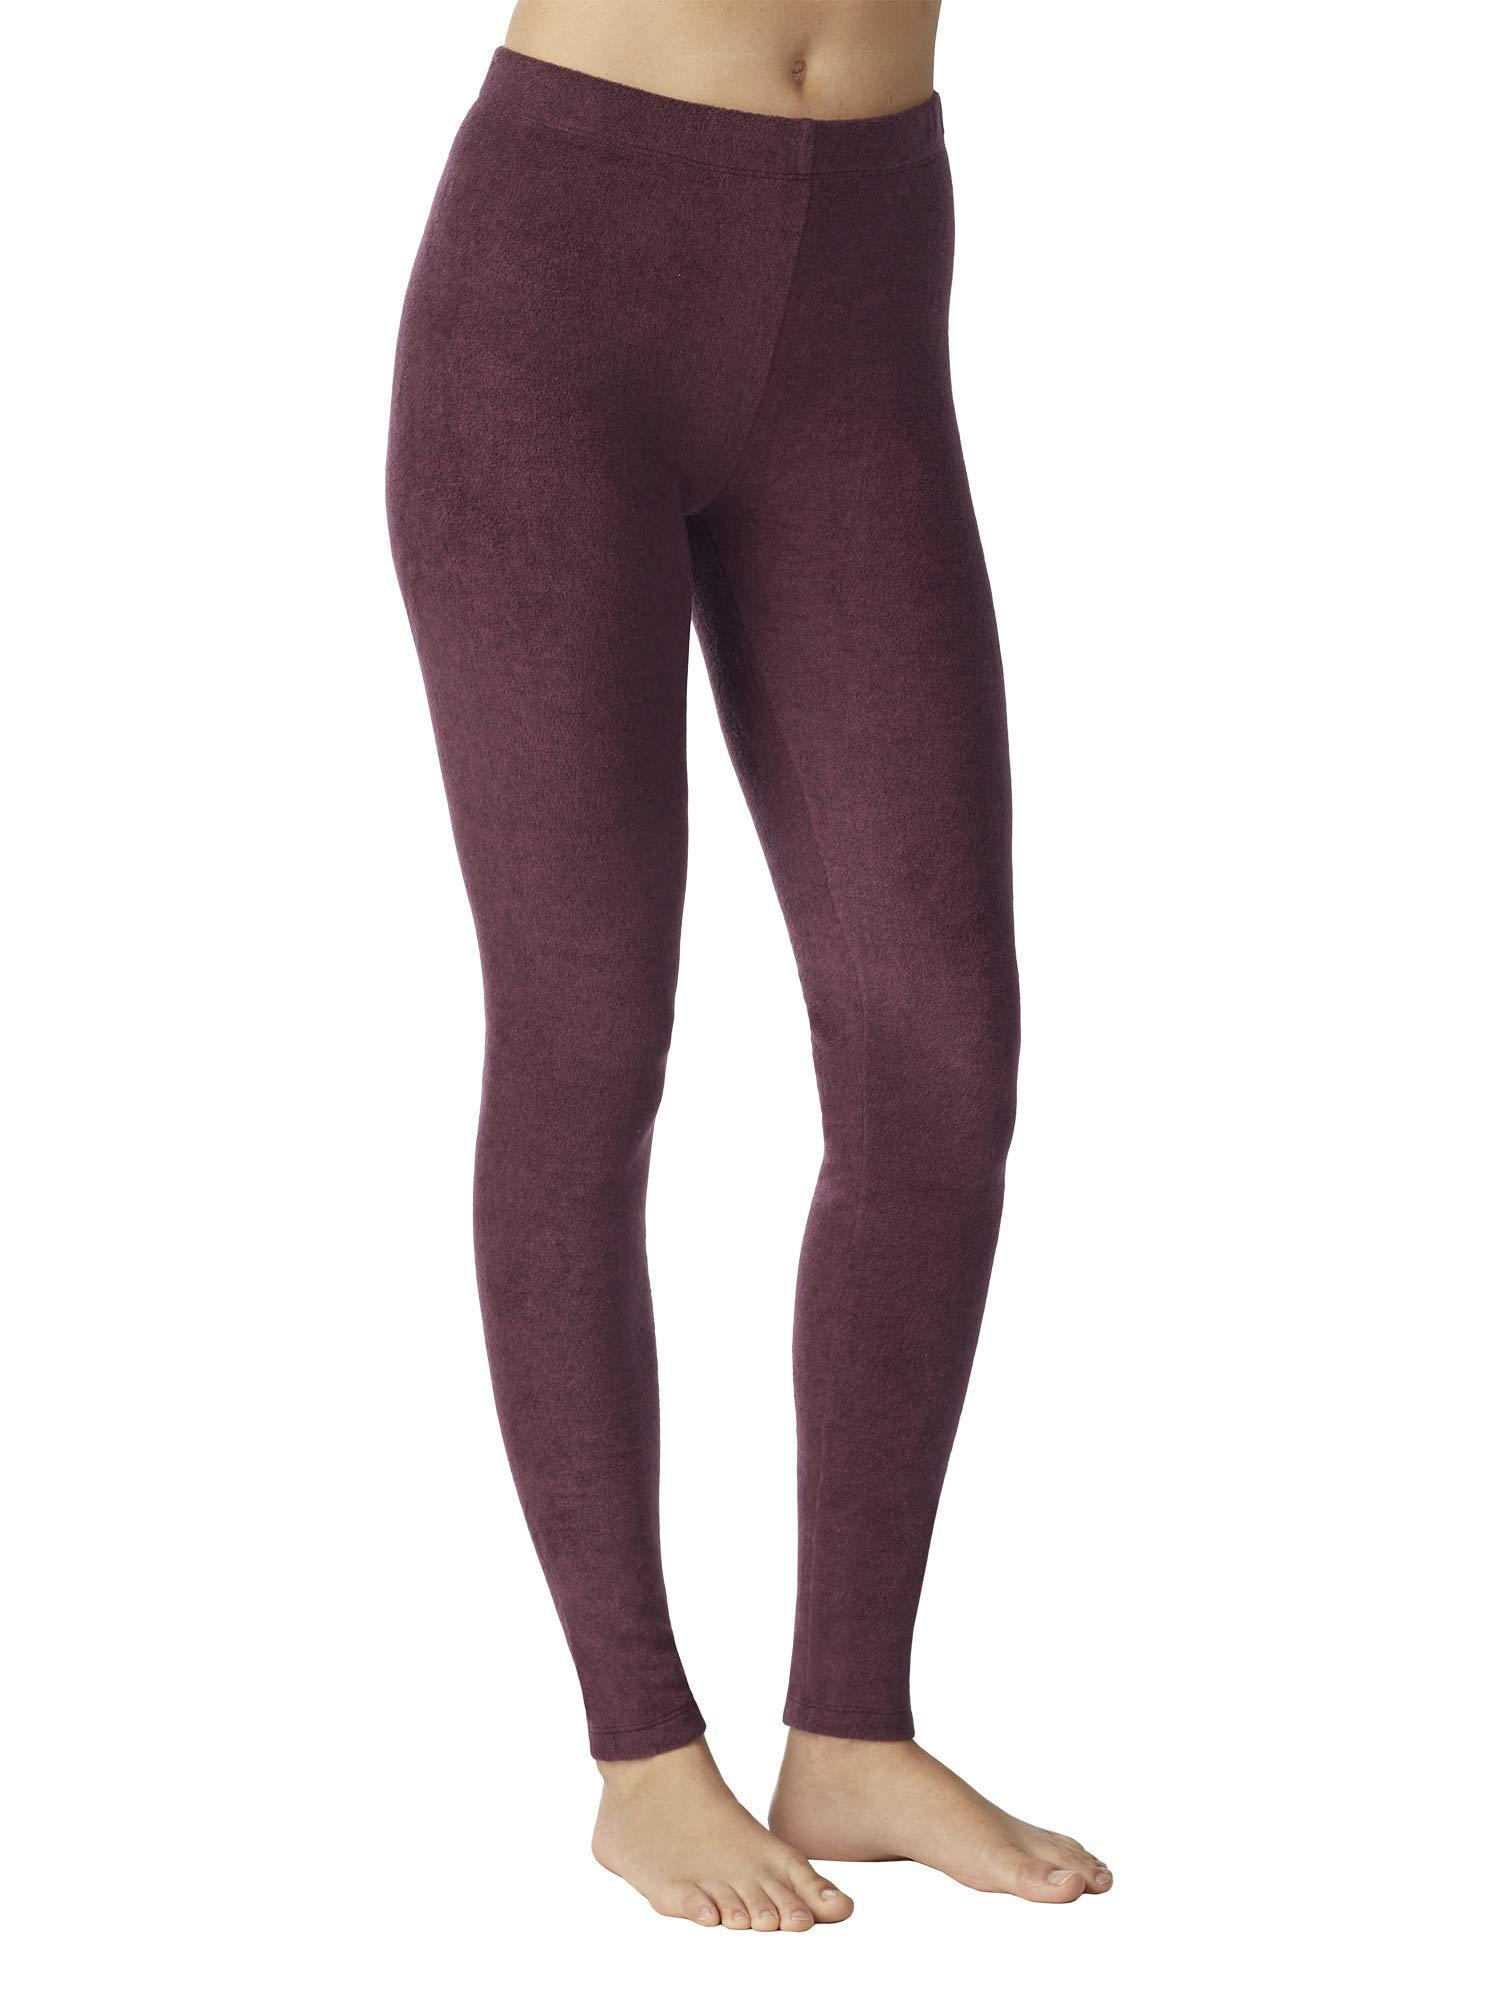 Cuddl Duds ClimateRight Womens Stretch Fleece Warm Underwear Leggings/Pants (Large, Dark Berry Heather) by Cuddl Duds